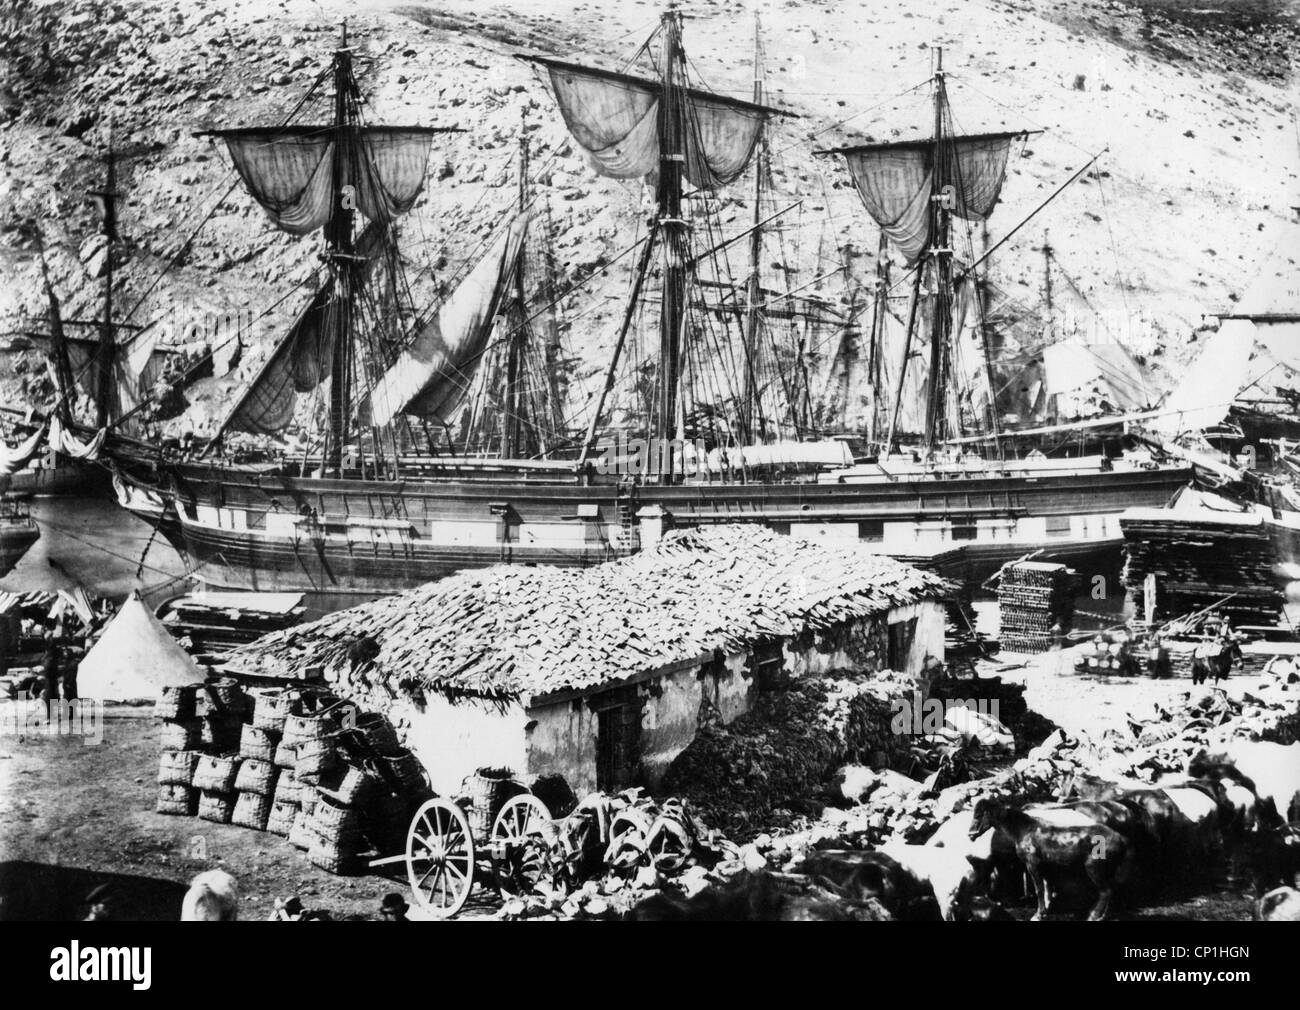 Crimean War 1853 - 1856, siege of Sevastopol 17.10.1854 - 9.9.1855, British supply ships at the roadstead of Balaklava, - Stock Image